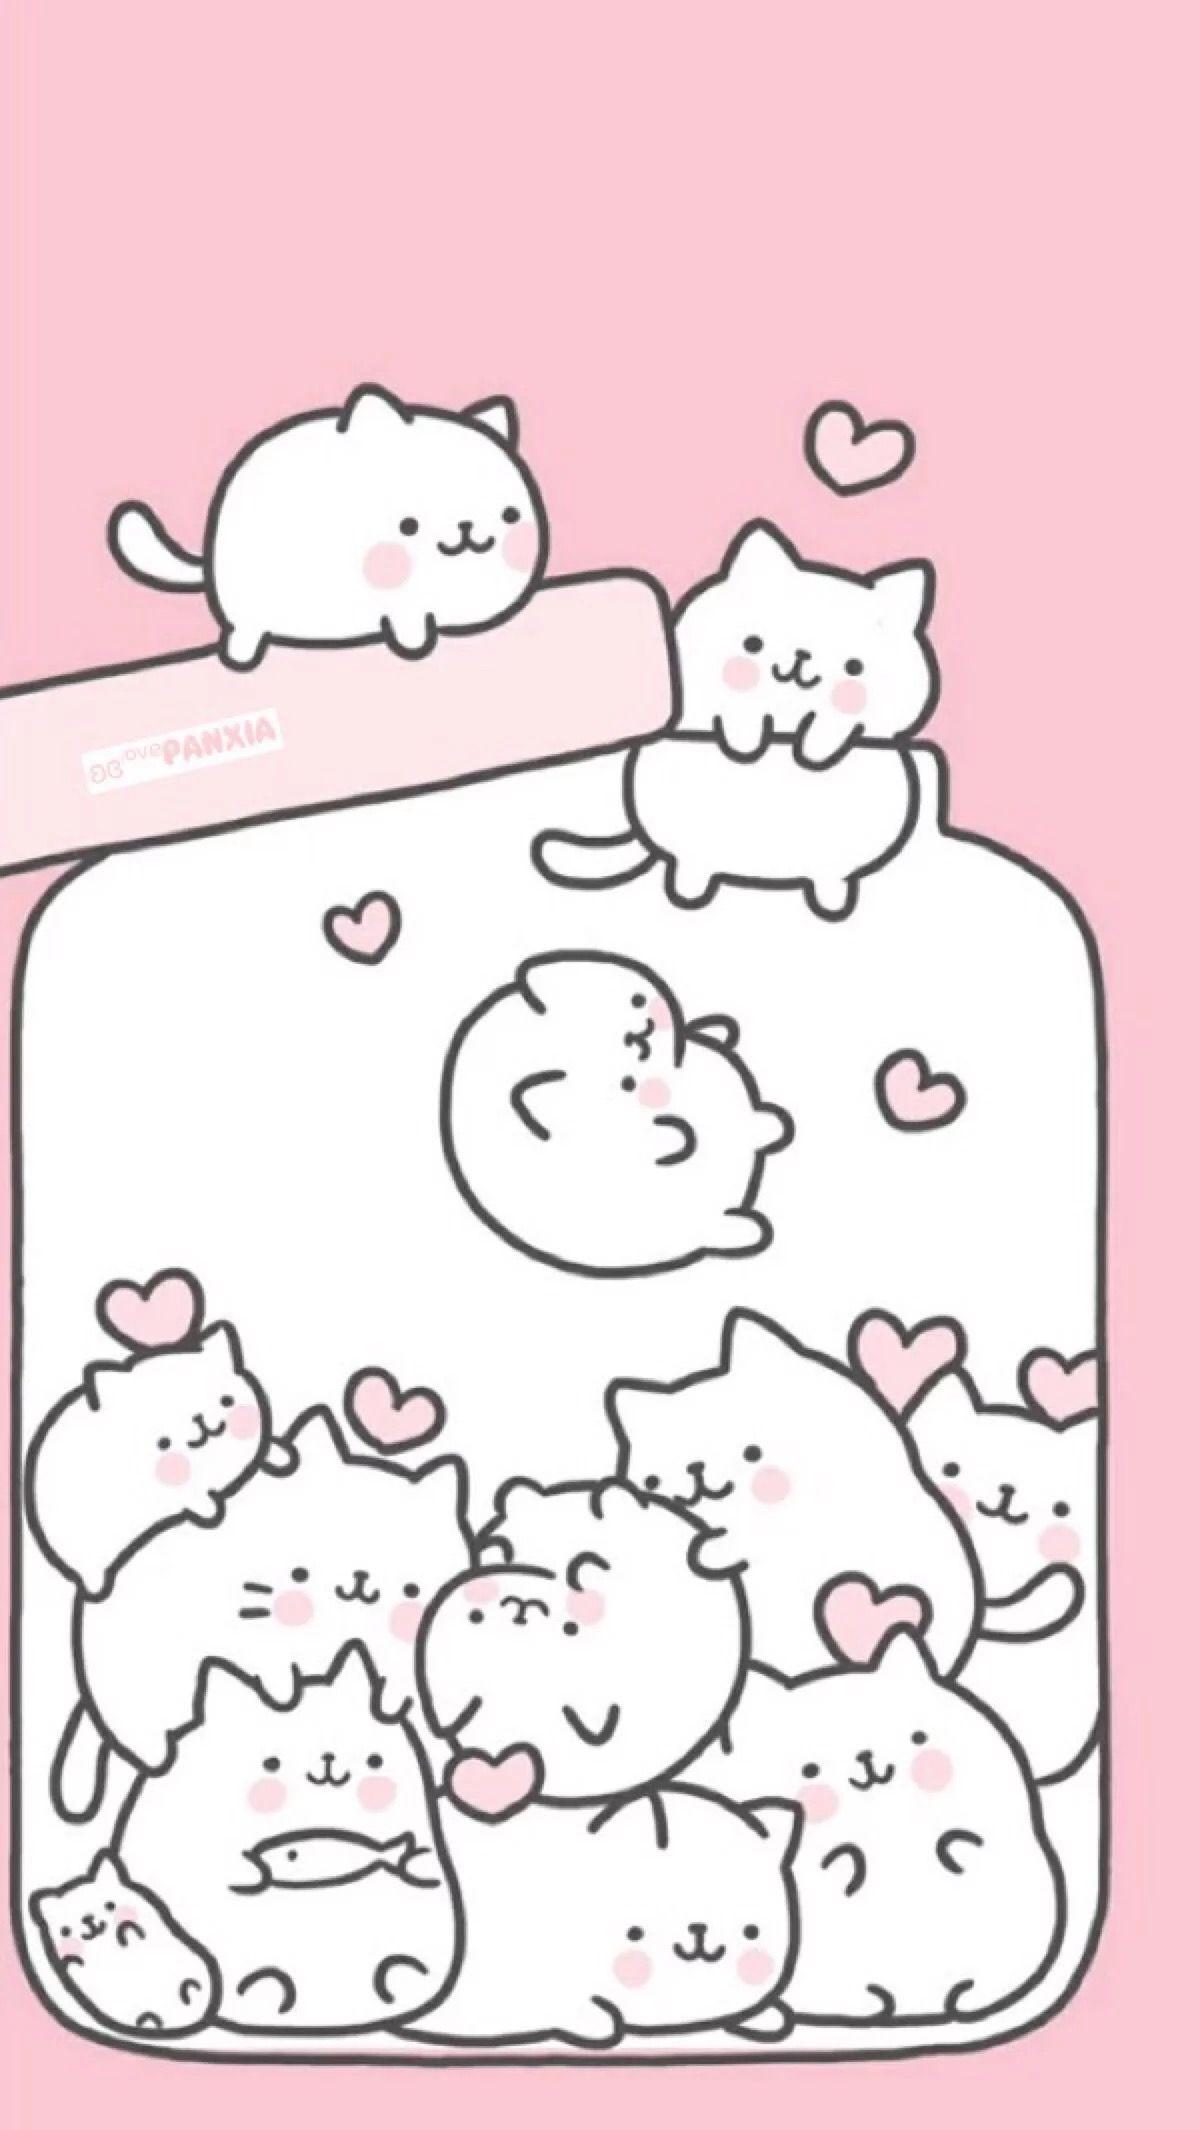 Dessins chats kawaii | Cute wallpapers, Kawaii background